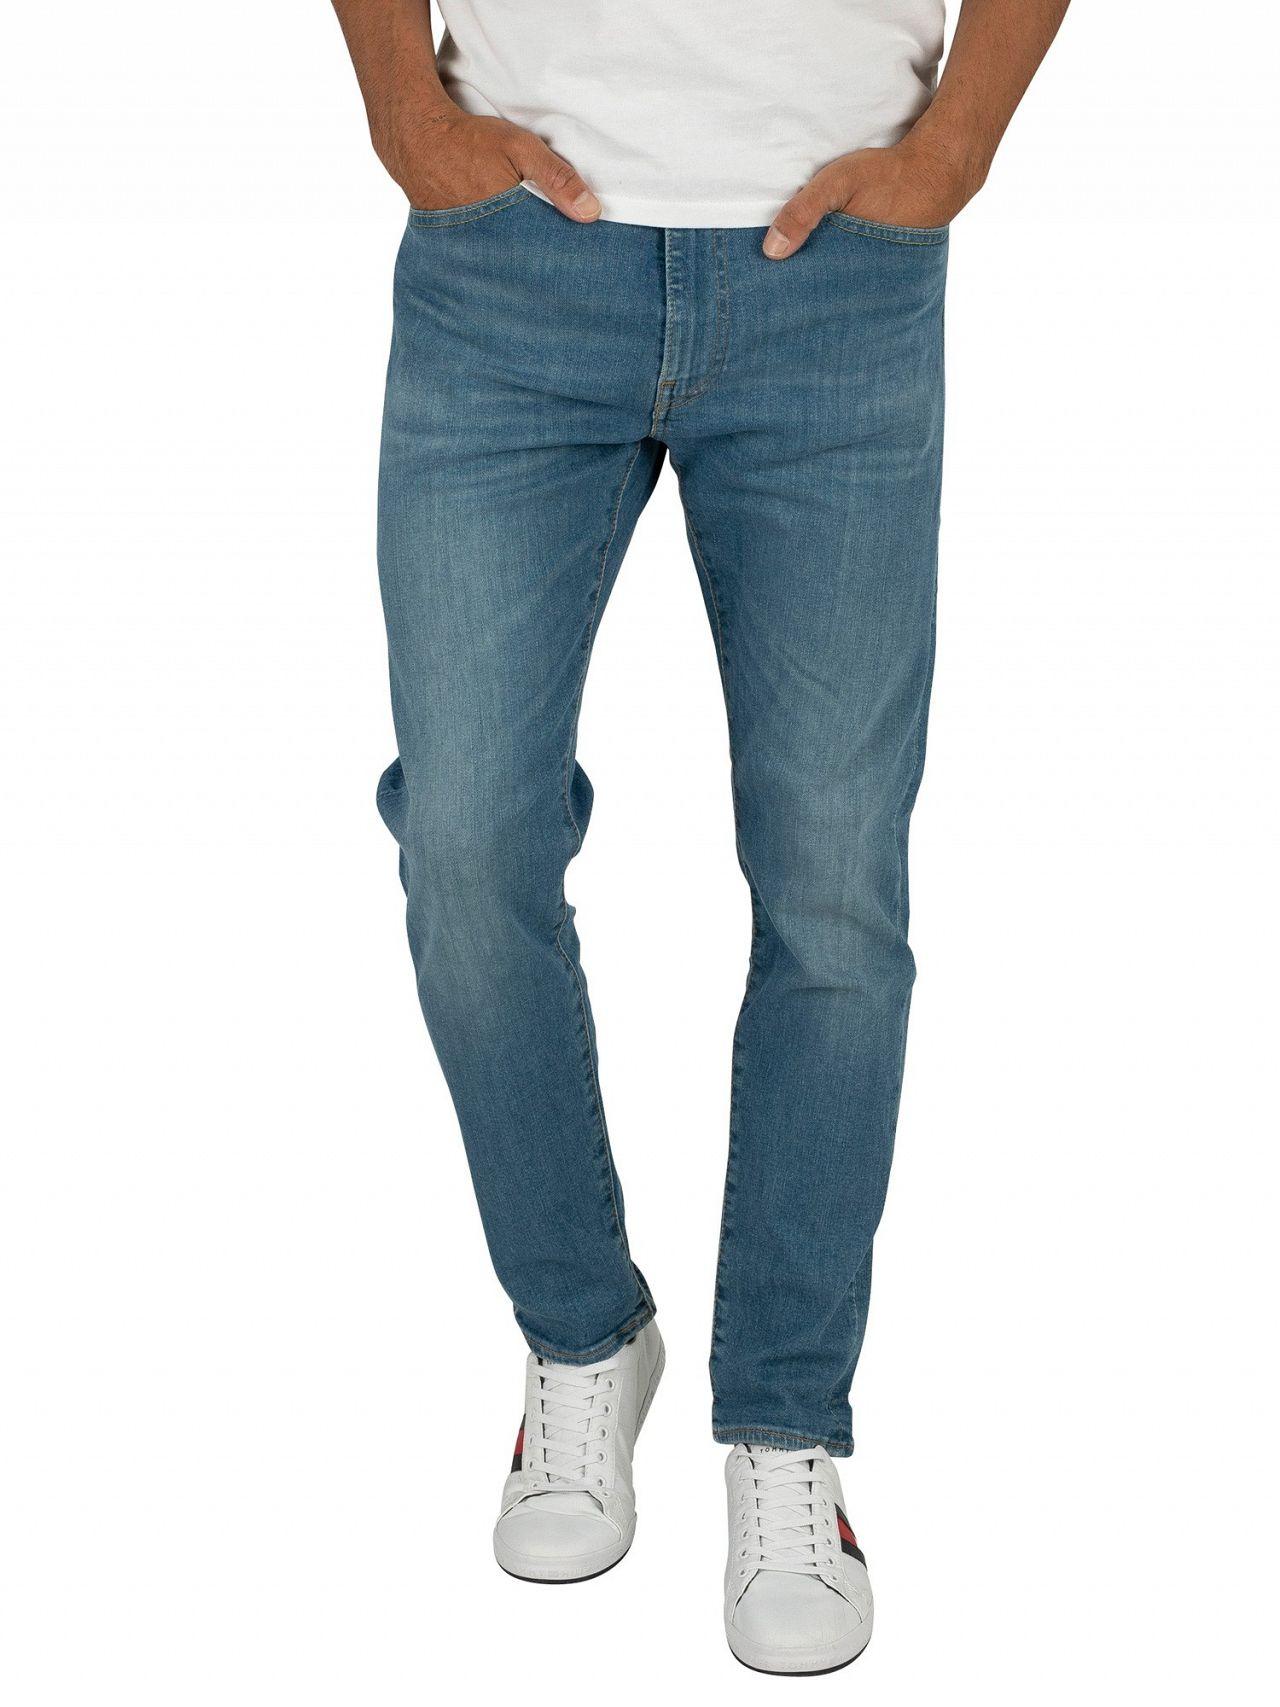 85d6203602 Levi's 4 Leaf Clover 512 Slim Taper Jeans | Standout